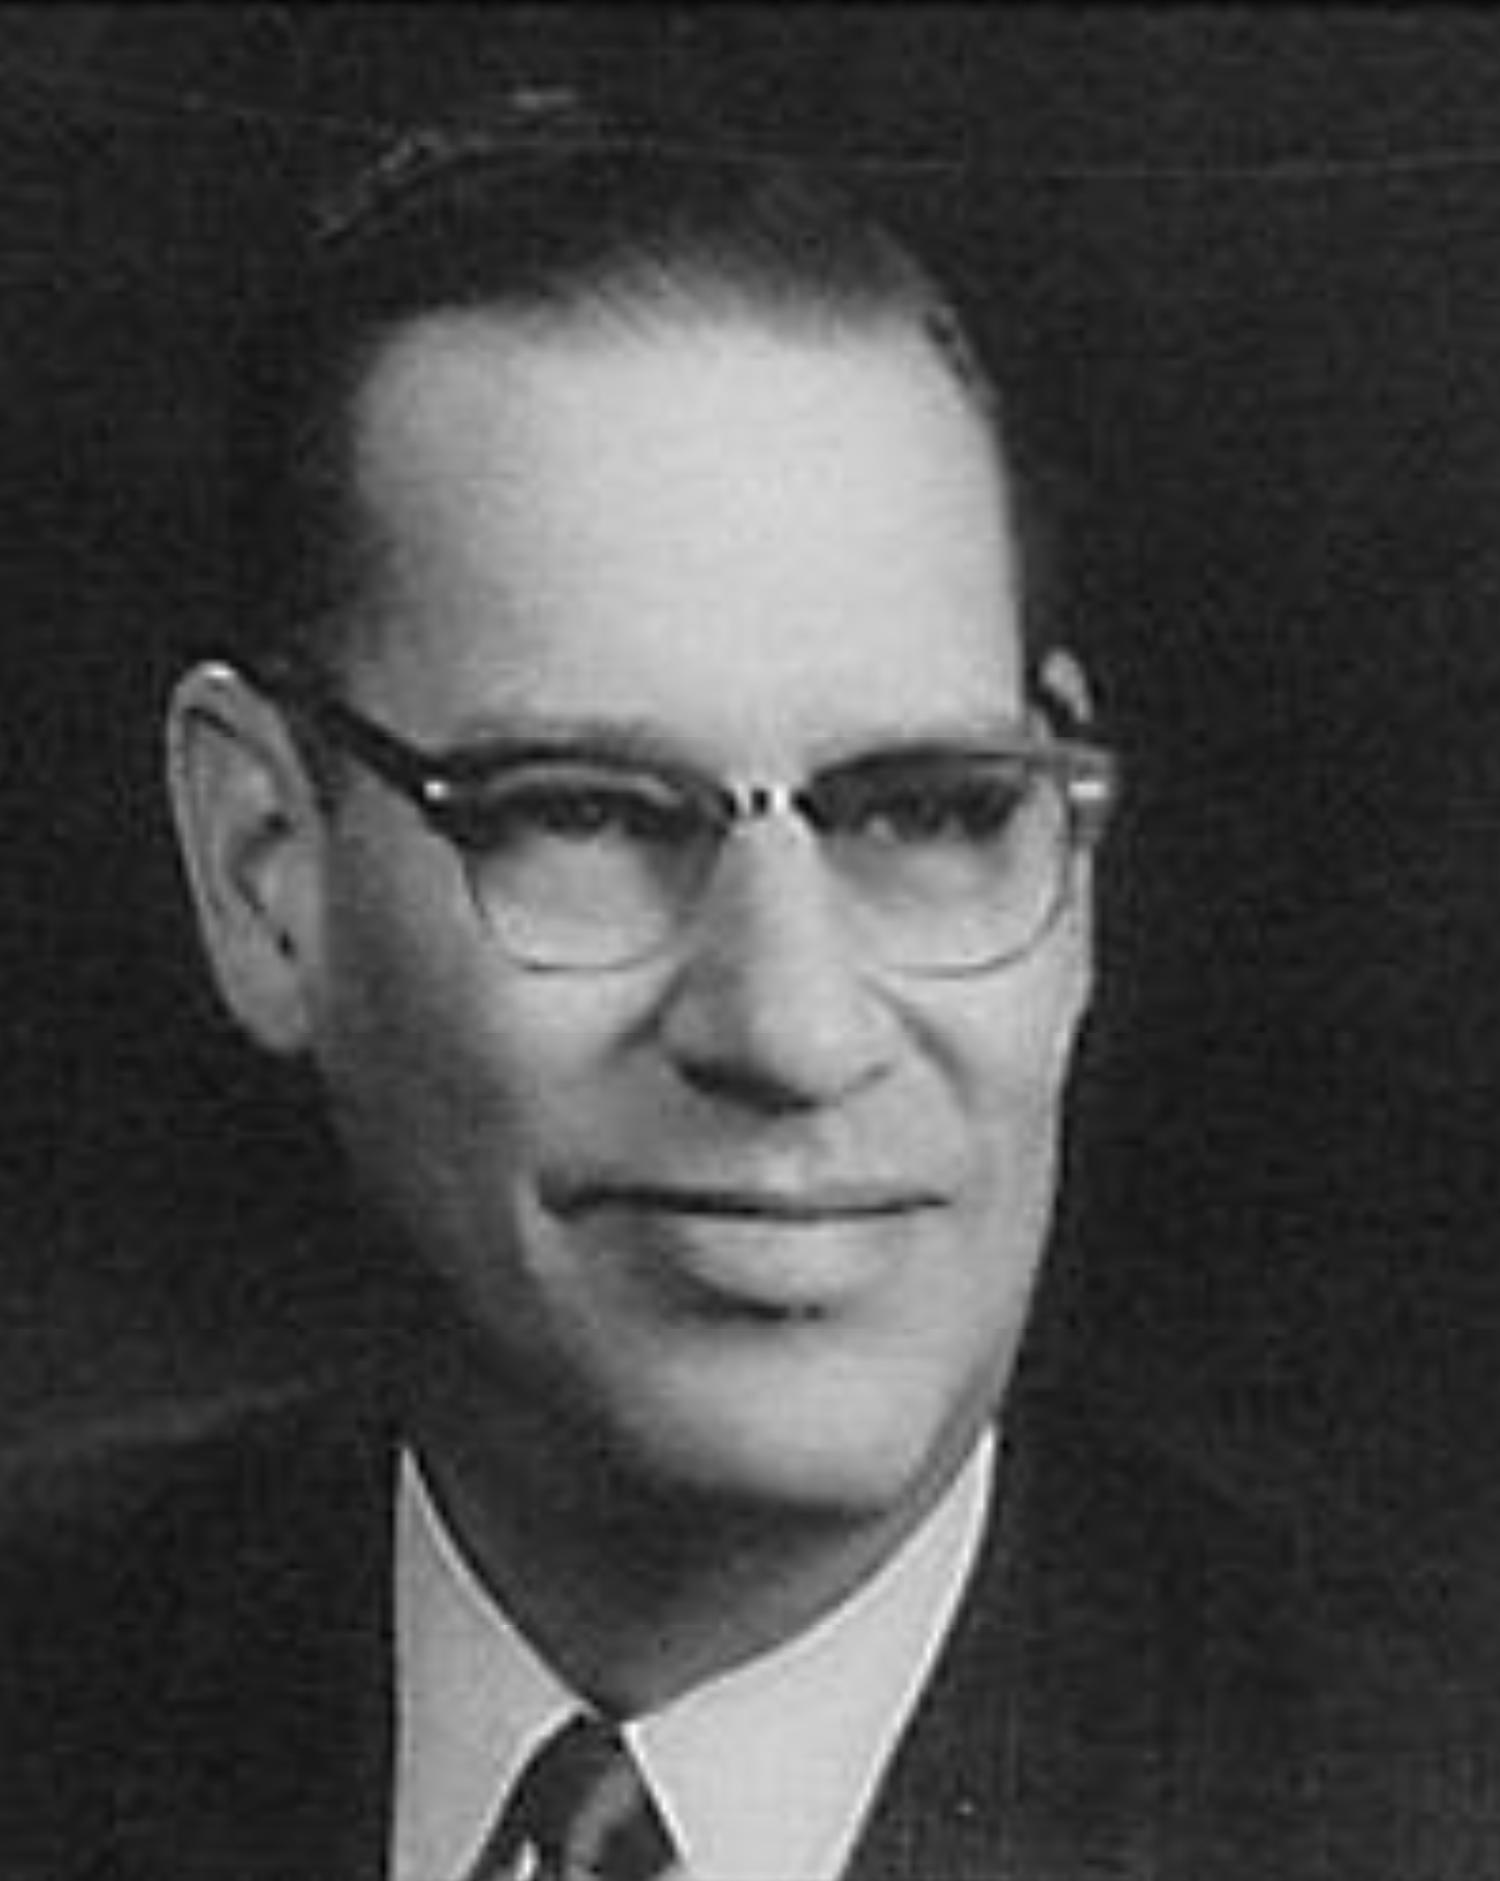 ROBERT G. MORRISON, JR.